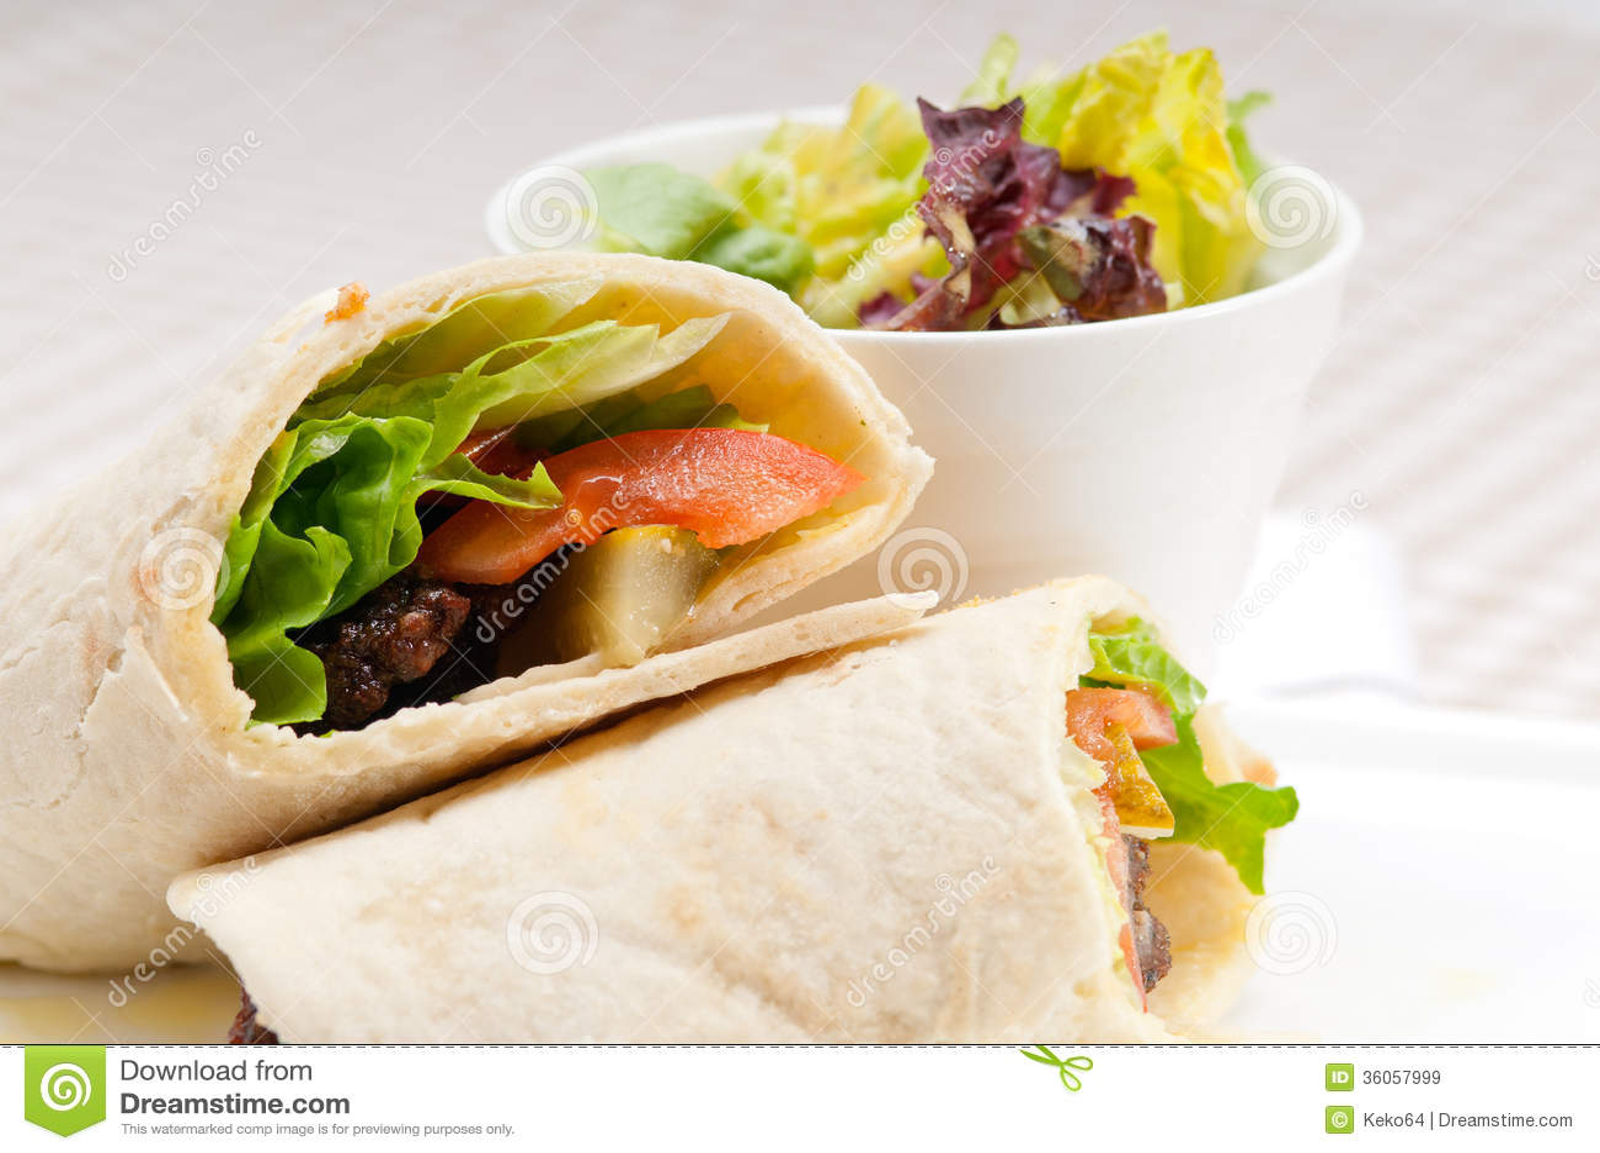 Chicken shawarma roll - photo#36